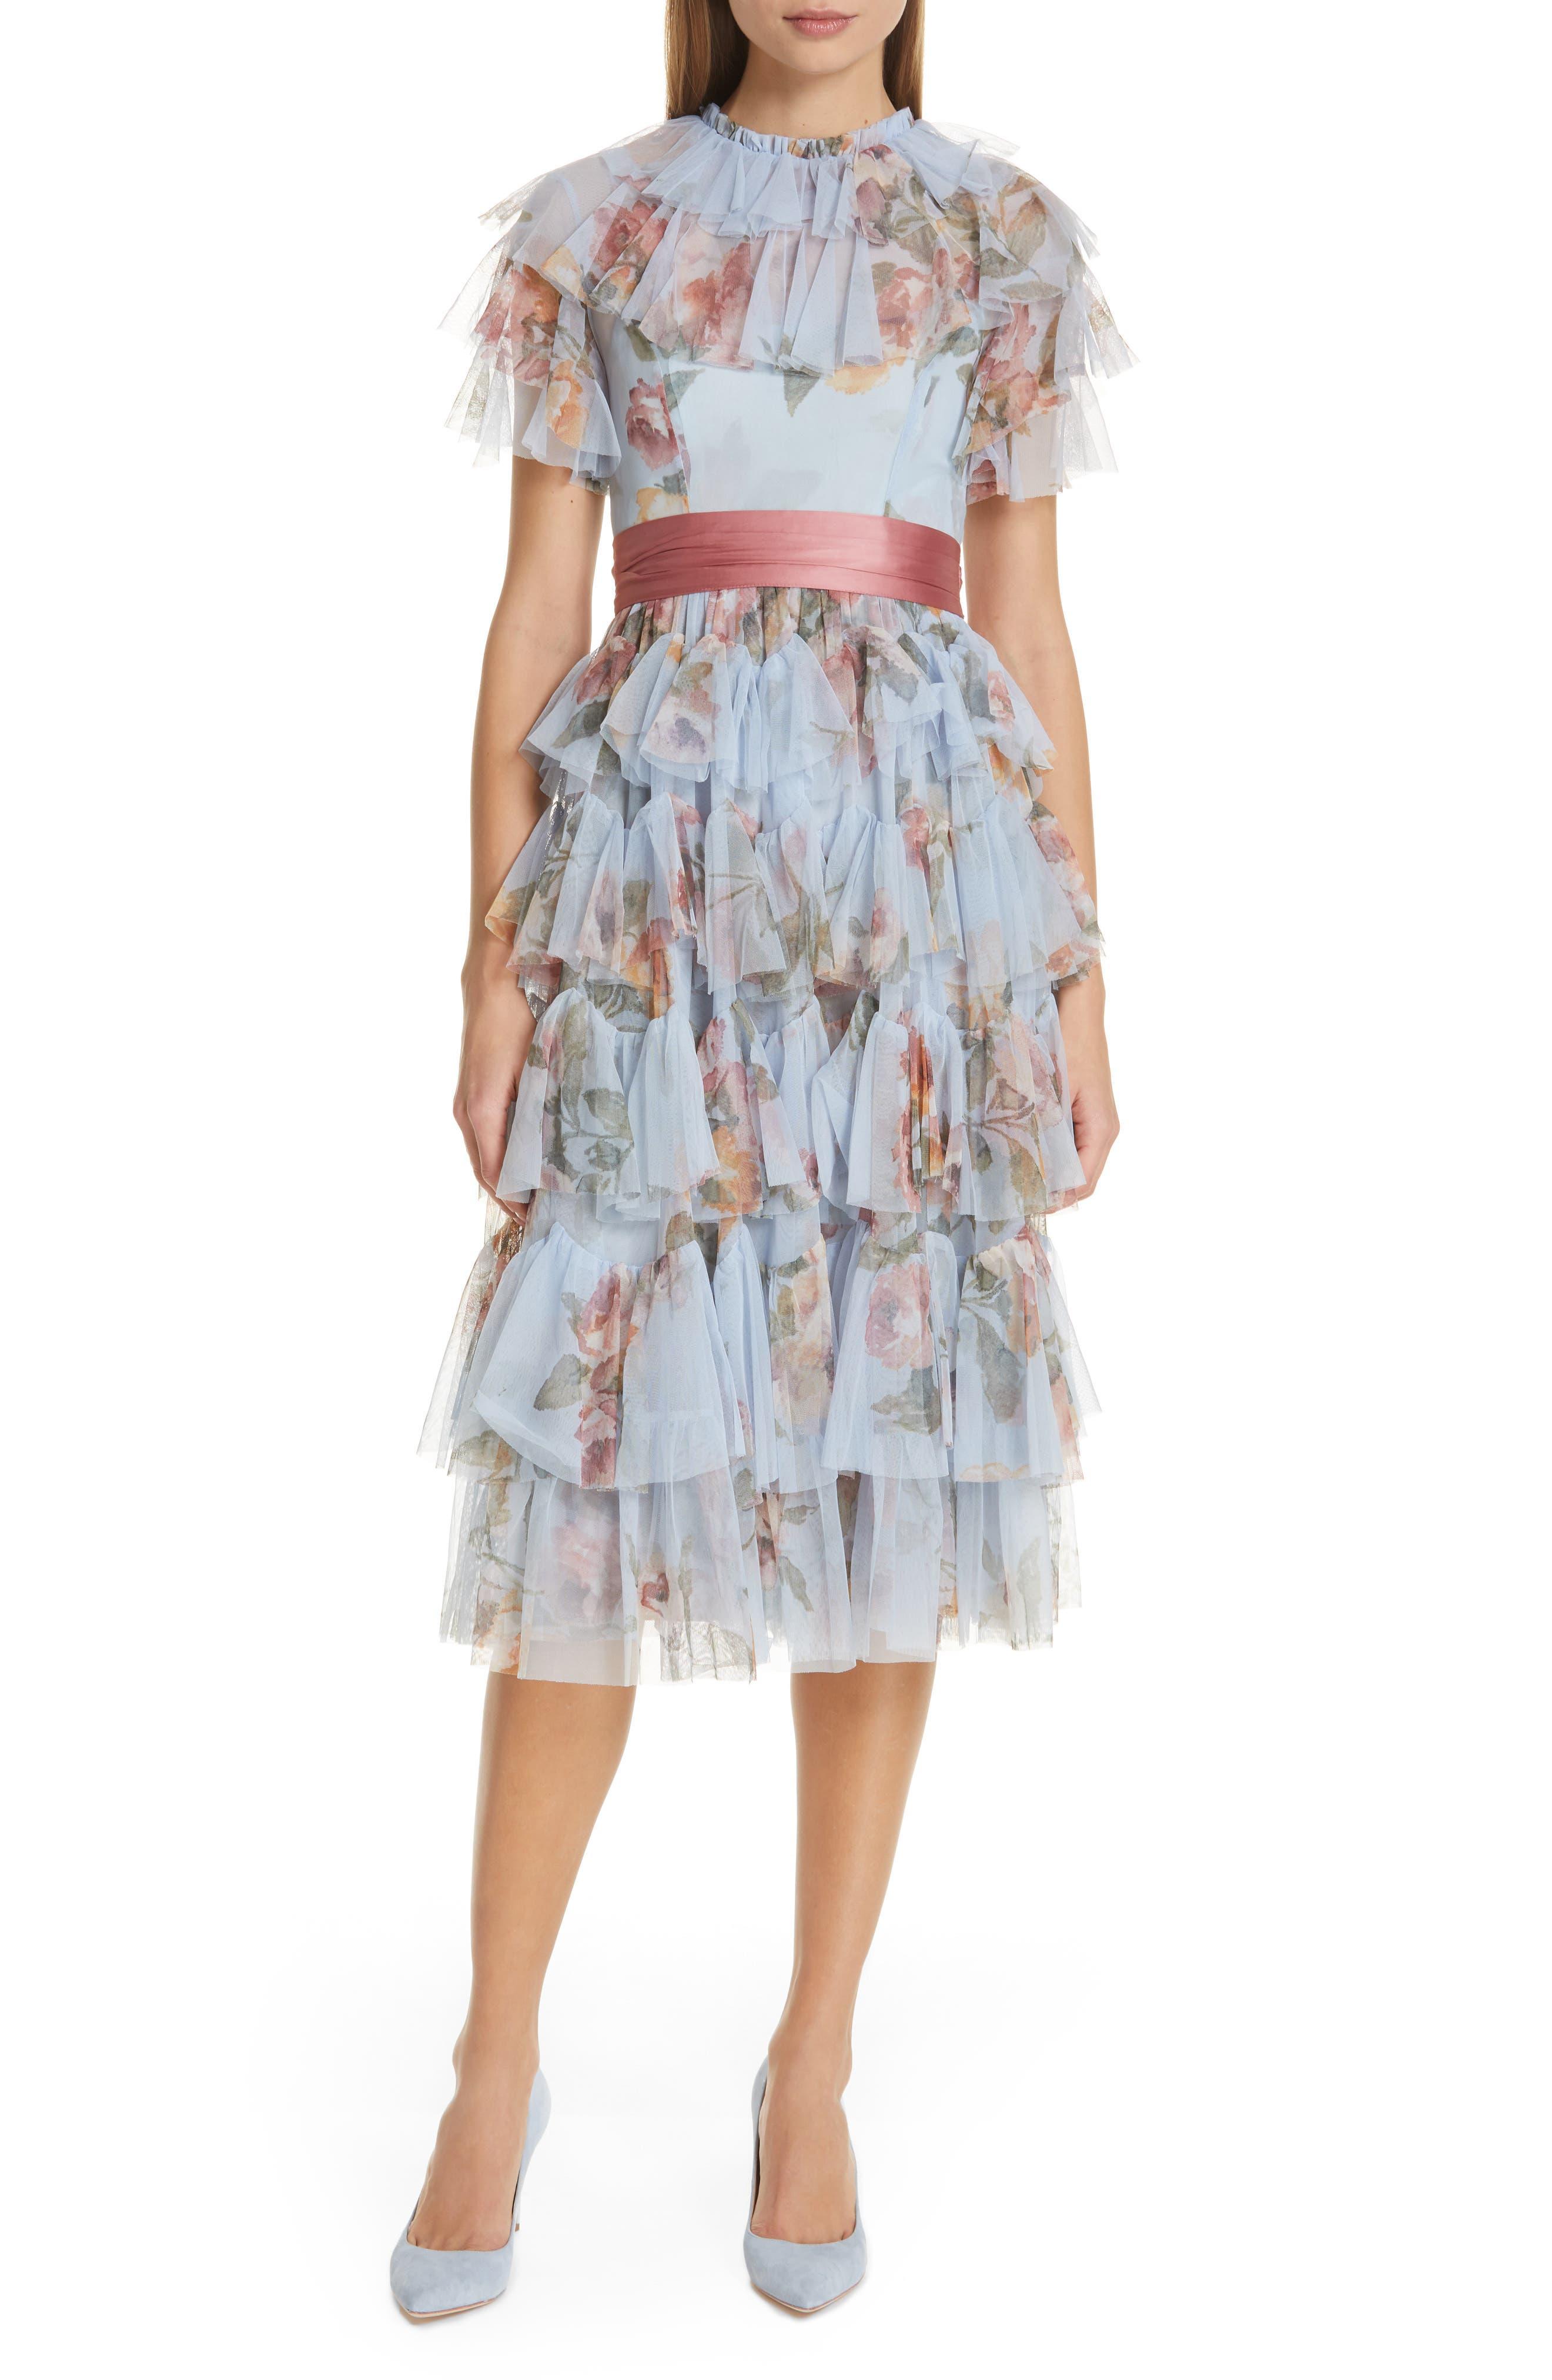 History of 1920s Day Dresses – Shop Day Dresses Womens Needle  Thread Venetian Rose Tulle Midi Dress $389.00 AT vintagedancer.com